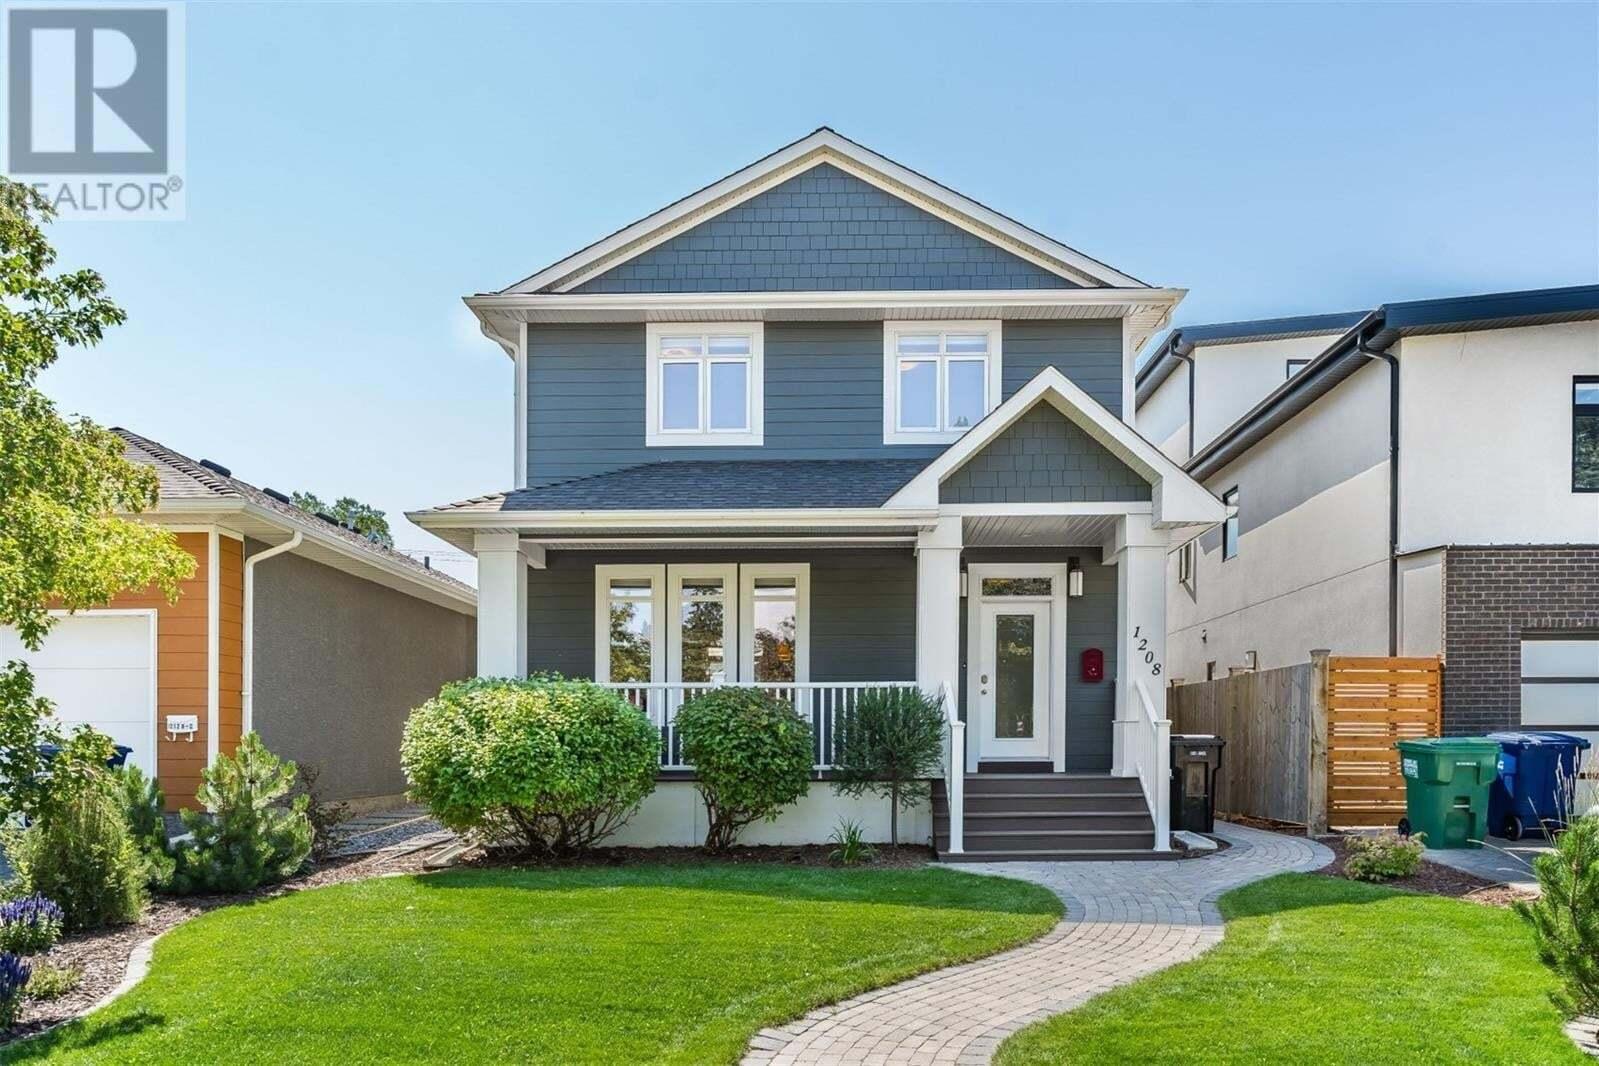 House for sale at 1208 10th St E Saskatoon Saskatchewan - MLS: SK819175